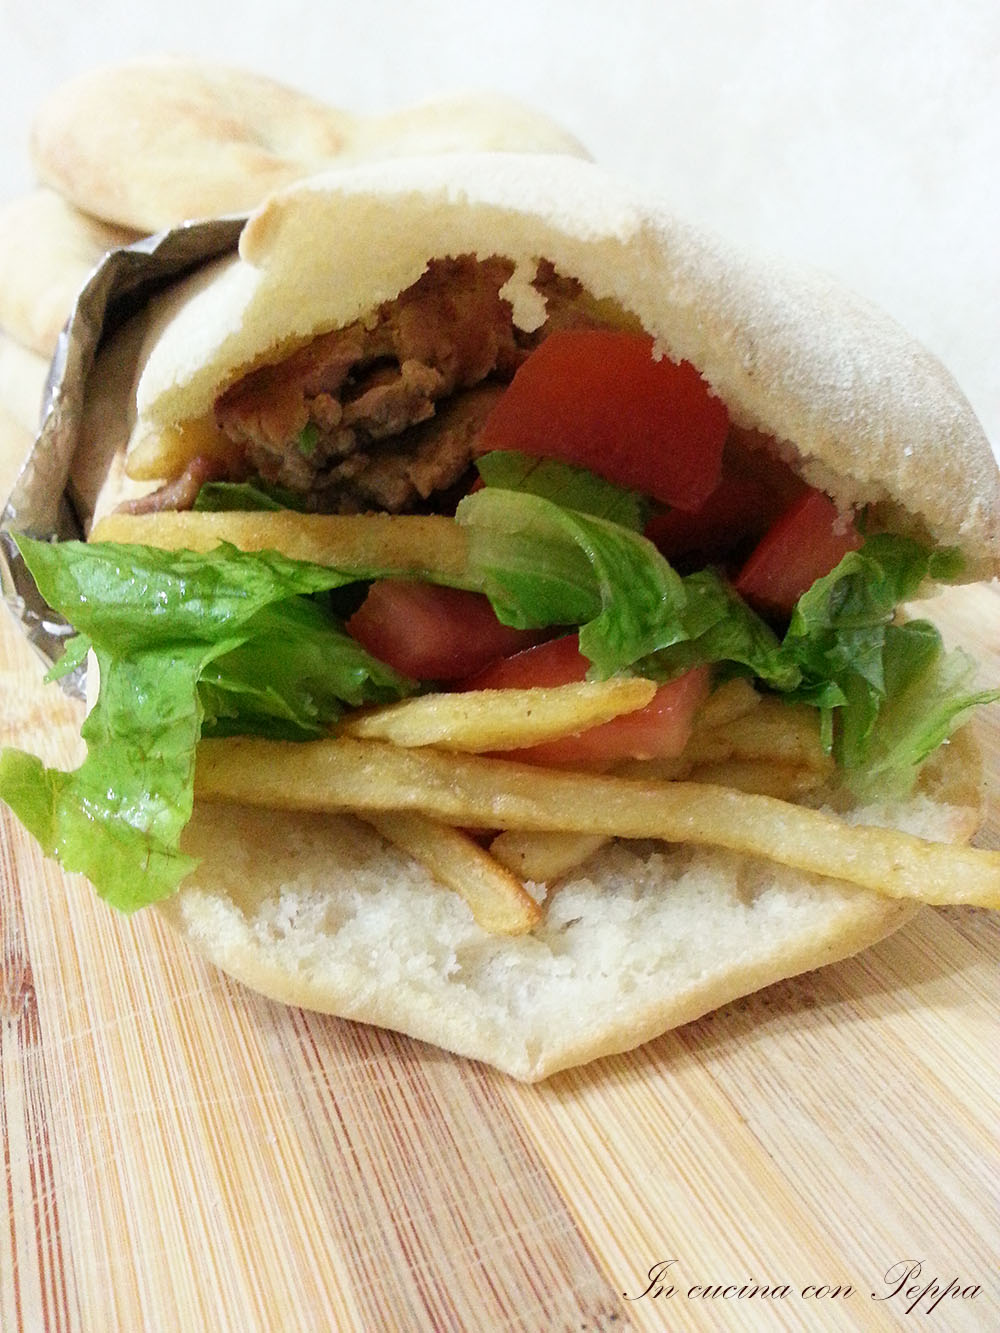 Ricetta Pane Arabo Per Kebab Bimby.Pane Arabo Bimby In Cucina Con Peppa